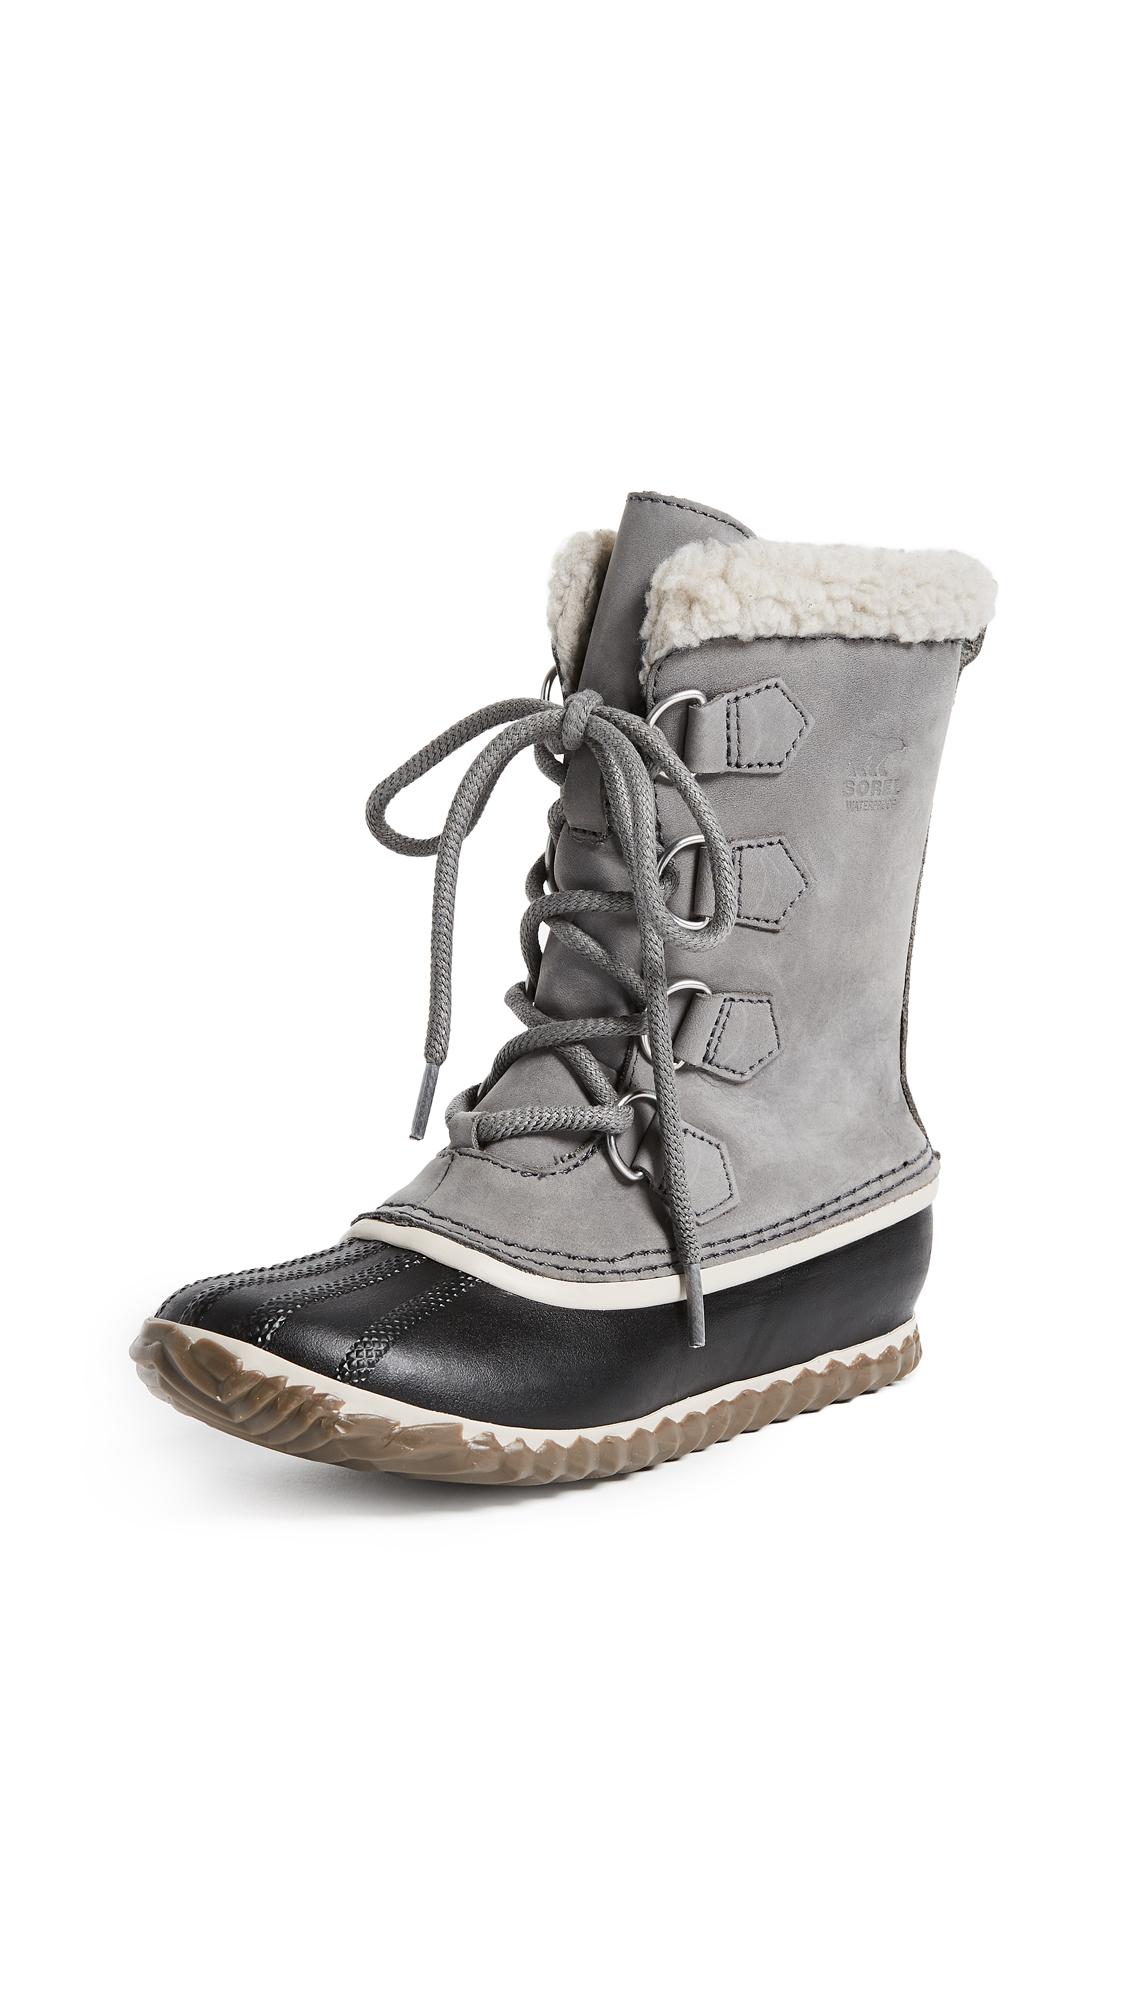 Sorel Caribou Slim Boots - Quarry